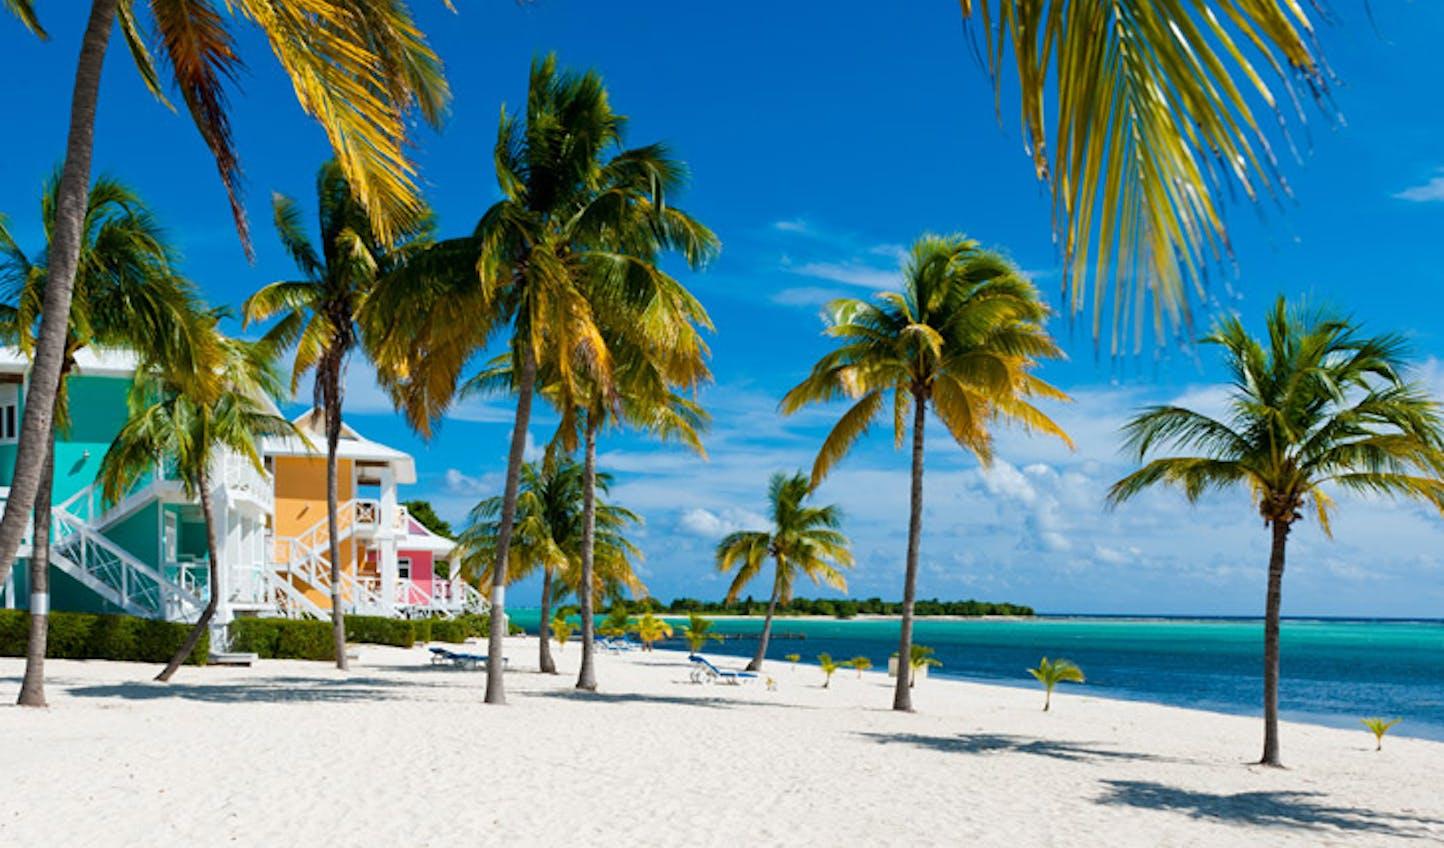 Southern Cross Club, Little Cayman